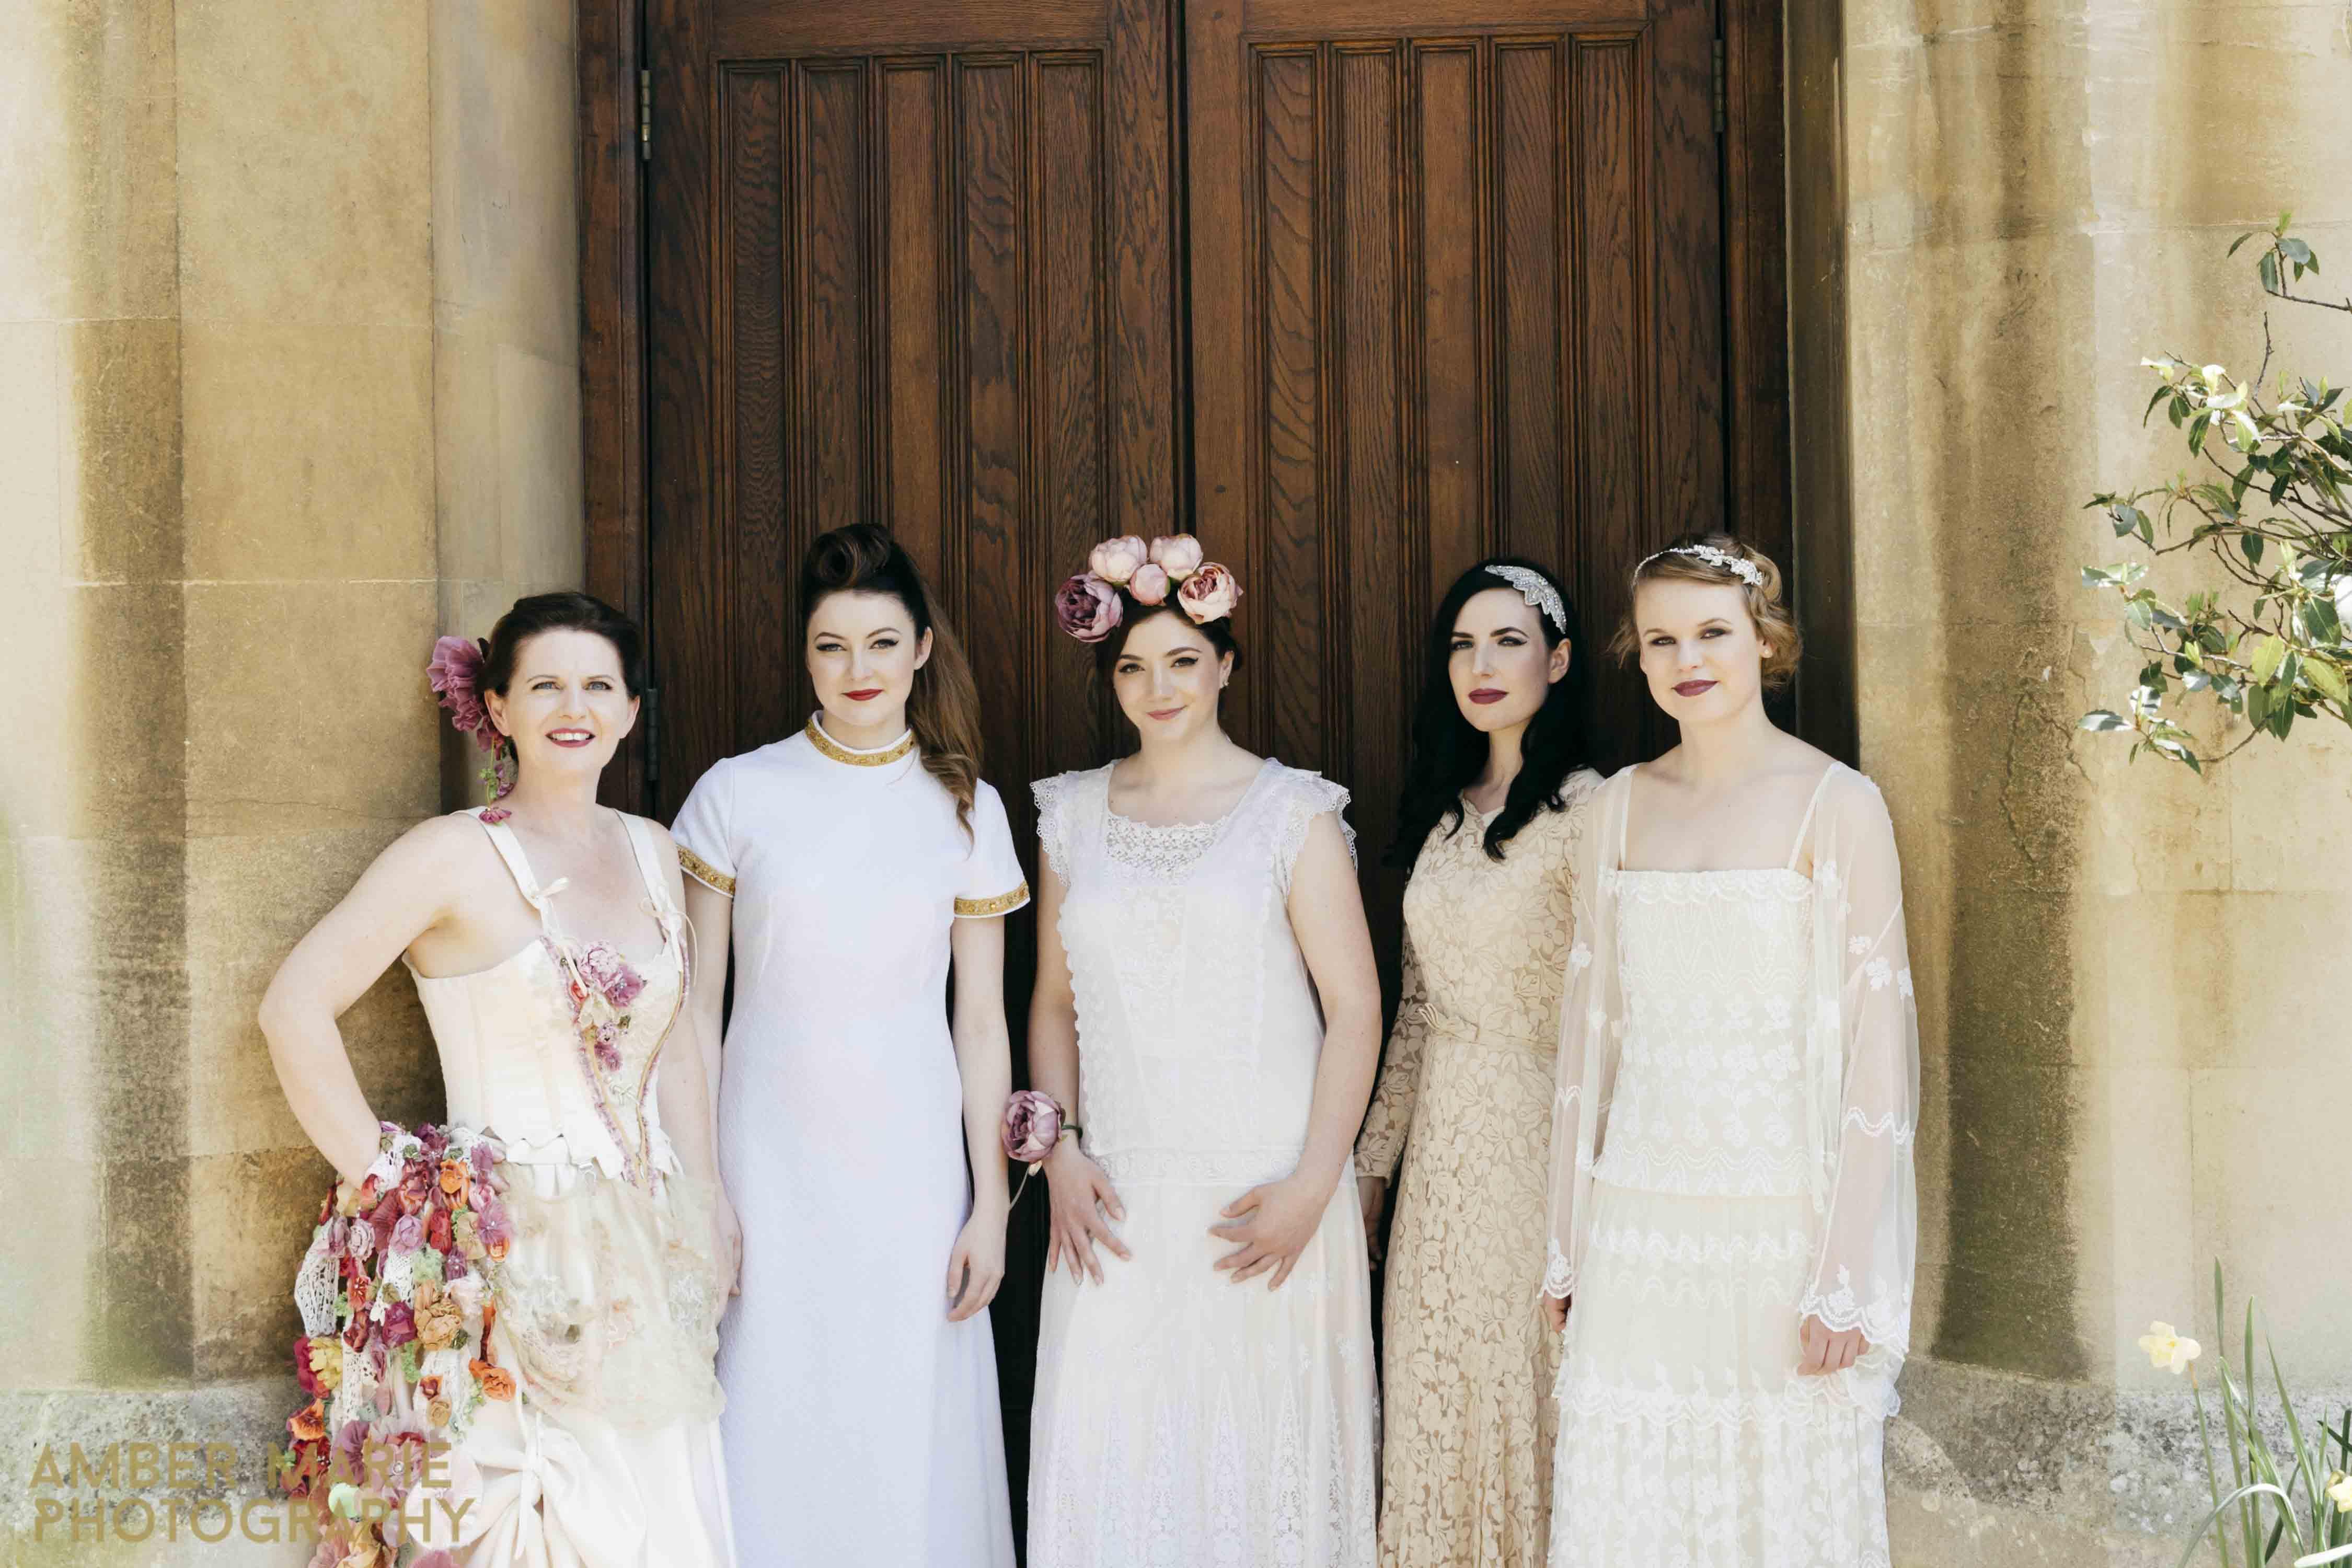 Vintage bridal portraits and bridal fashion photography by creative wedding yorkshire wedding photographer amber marie photography